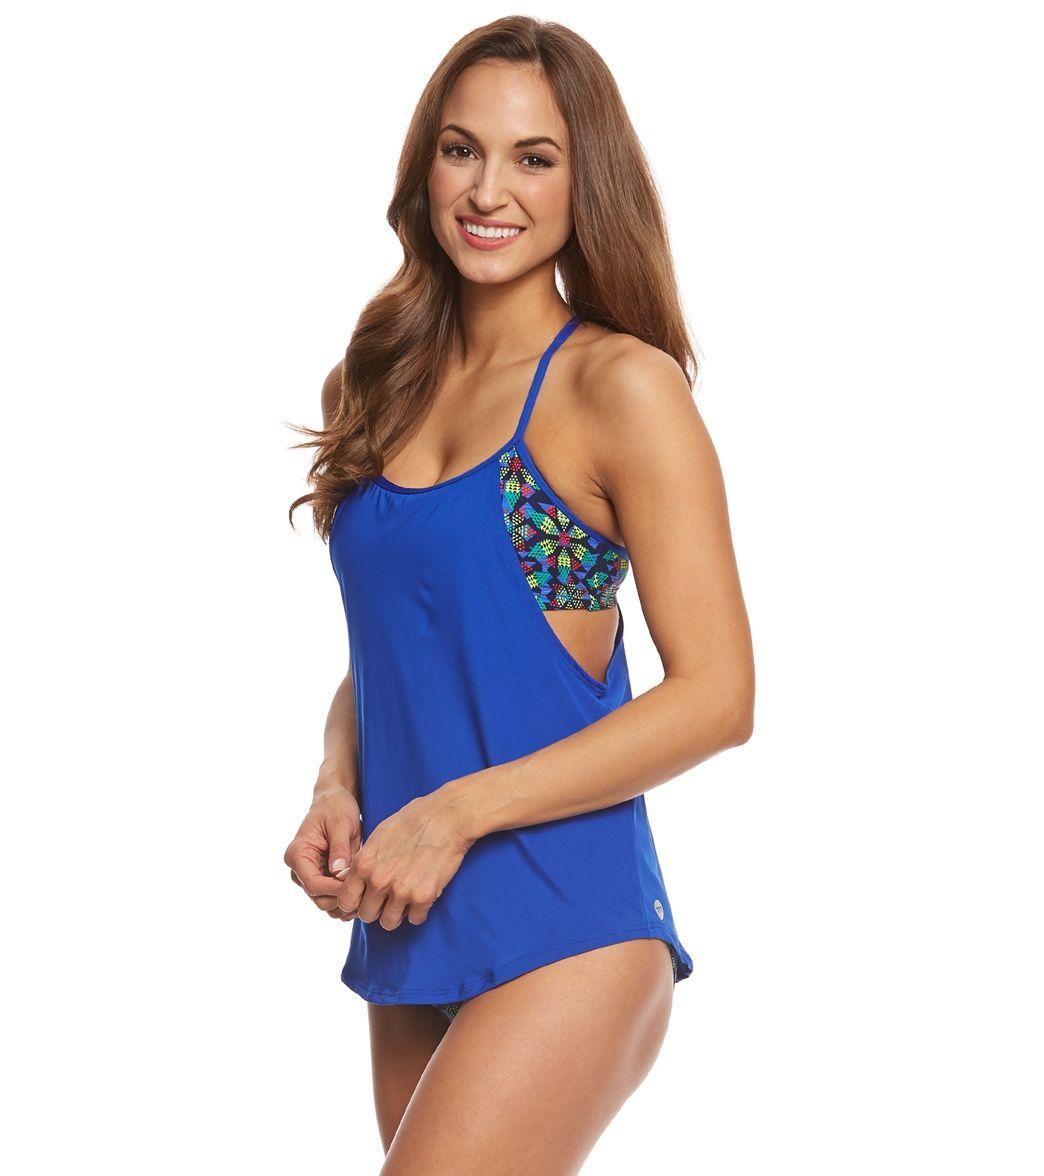 c69bede3d4 $45 TYR Women's Edessa Shea 2 in 1 Tankini Top at SwimOutlet.com – The  Web's most popular swim shop